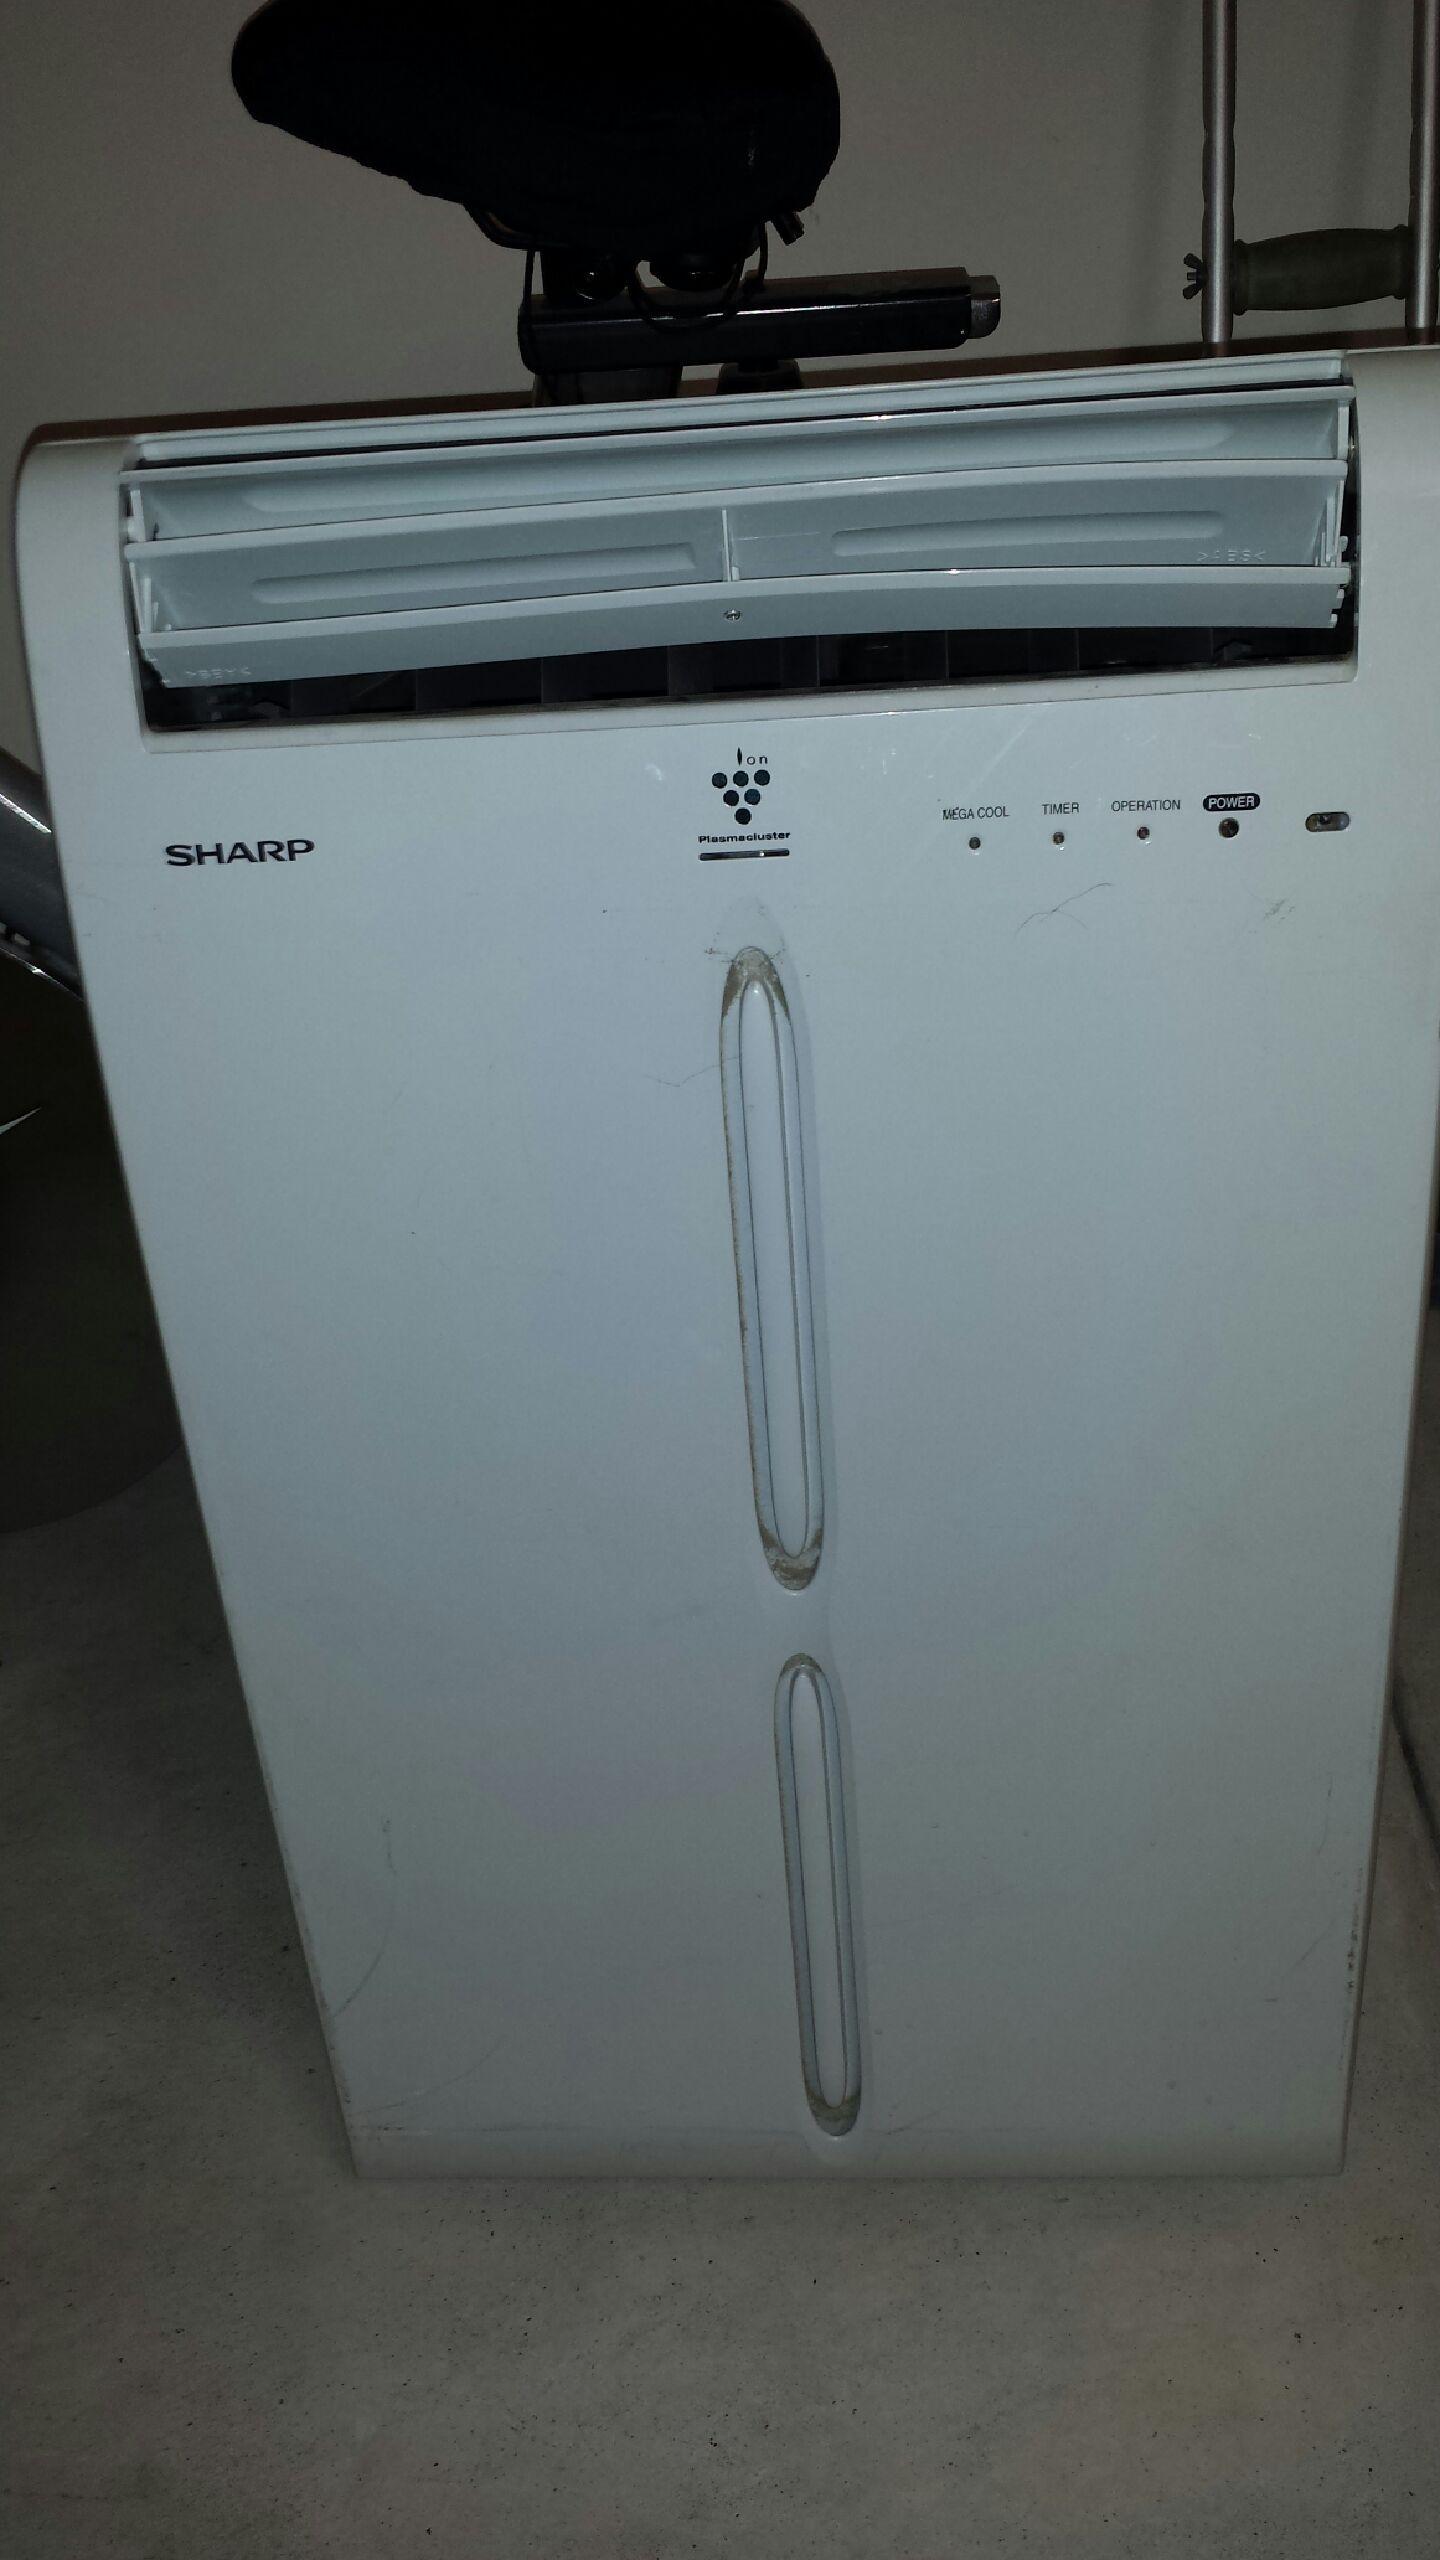 Sharp Portable AC unit 10000 btu in JMLachman's Garage ...